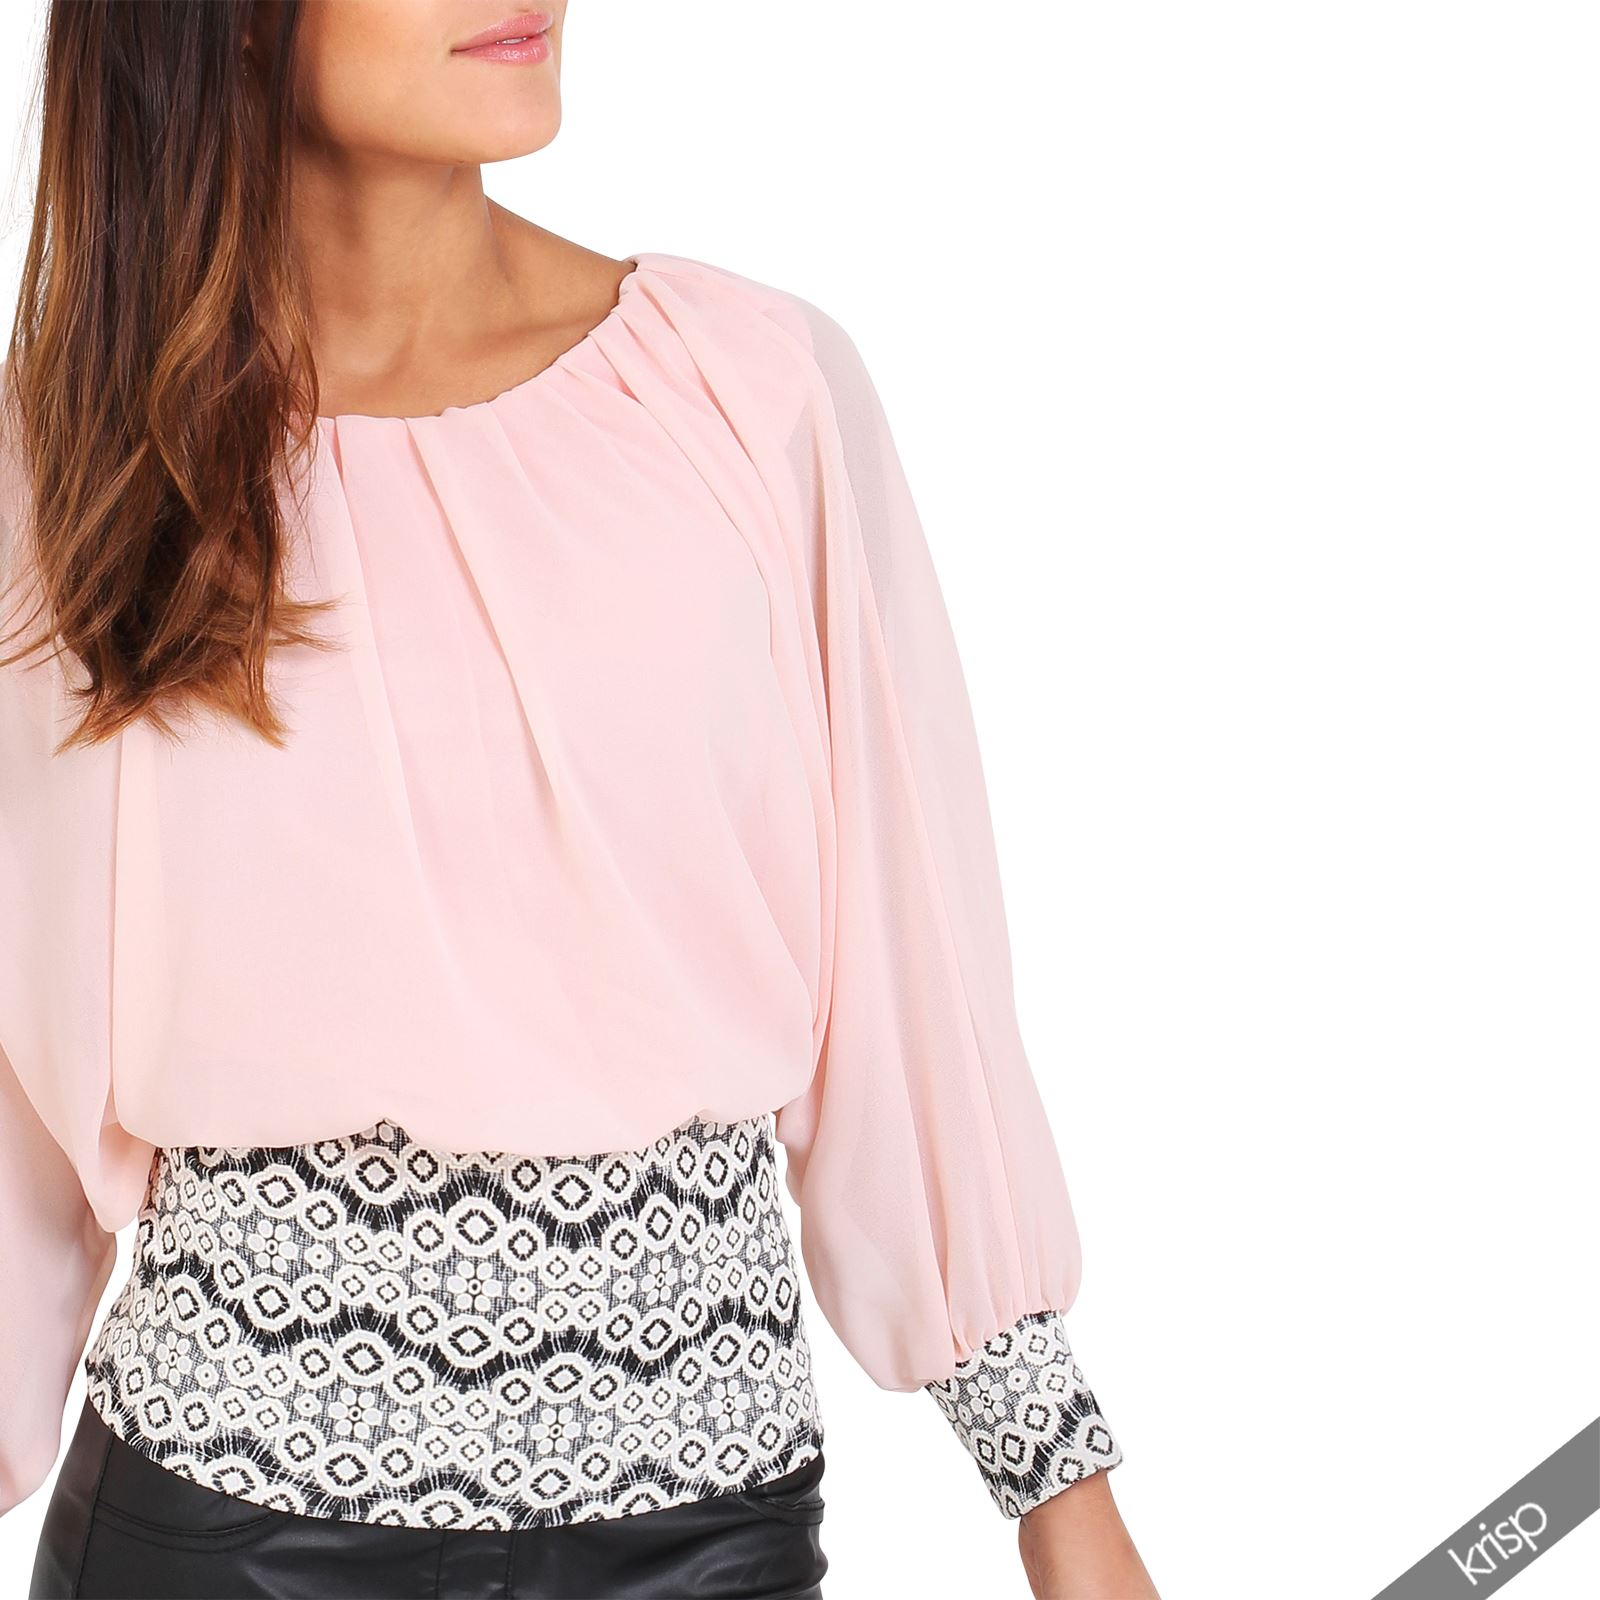 Femme top haut blouse contraste mousseline piss glamour sexy ebay - Haut sexy femme ...